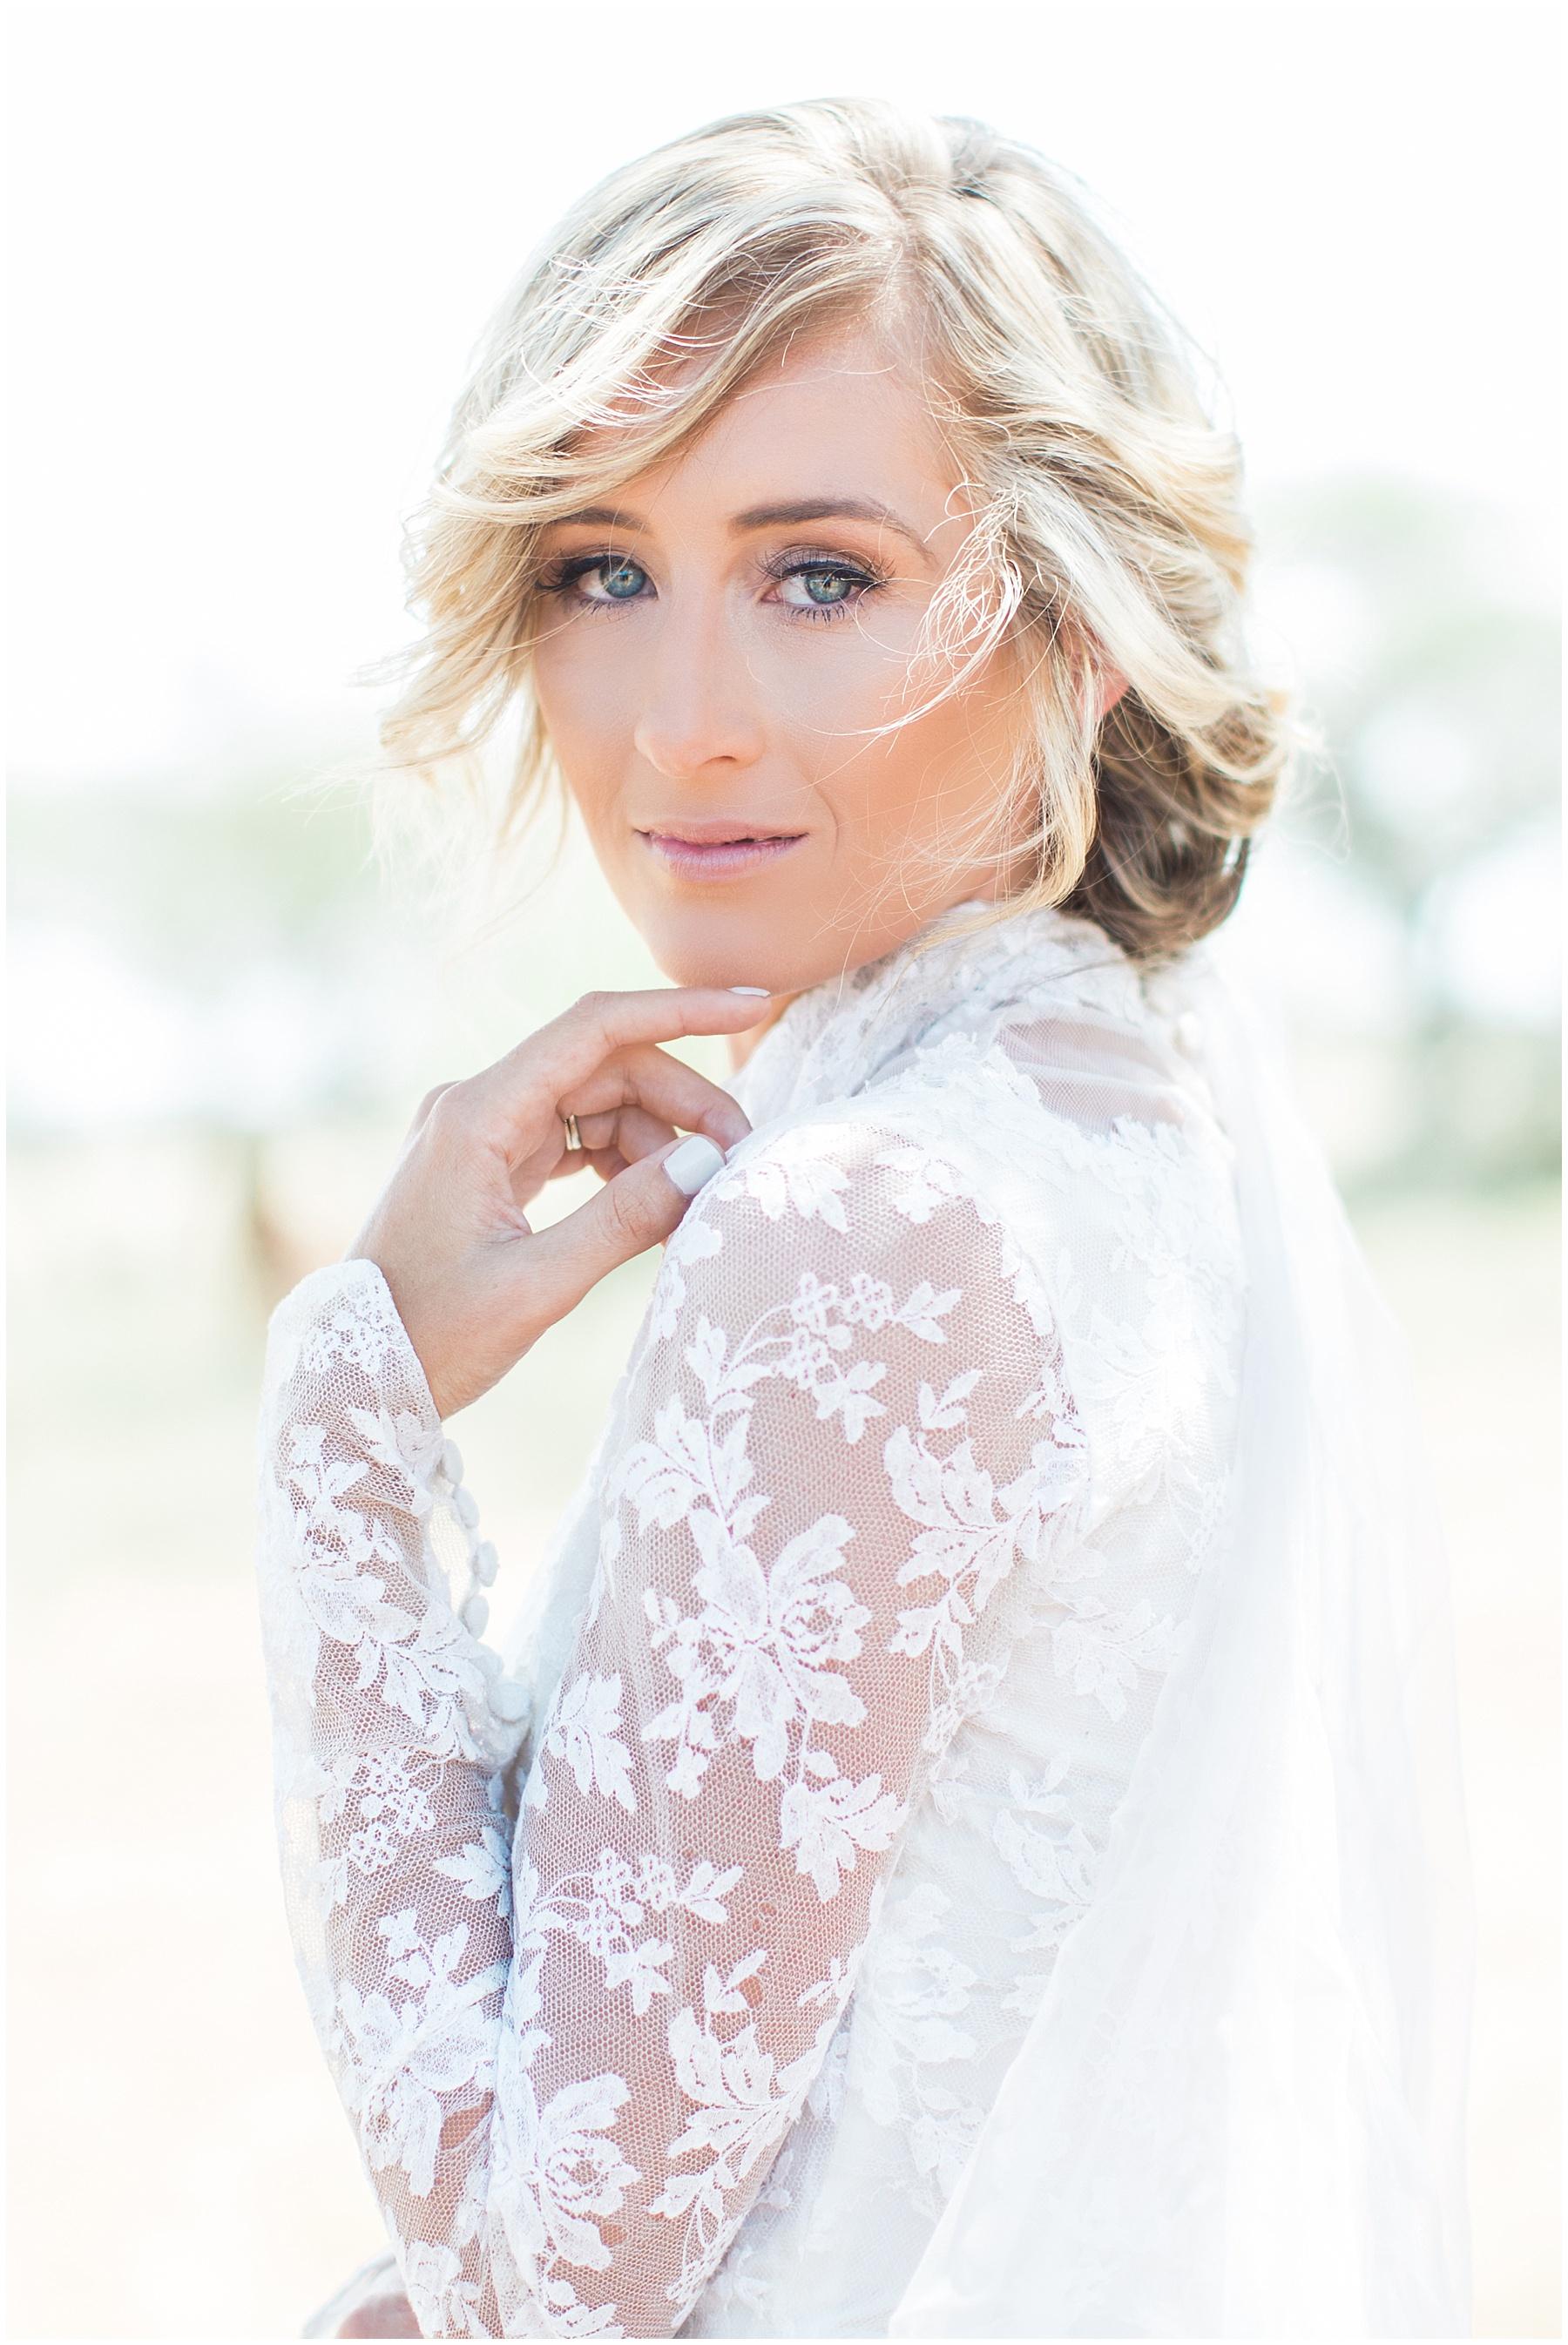 AliciaLandman_JoleneandZander_Wedding_The Pretty Blog_0434.jpg